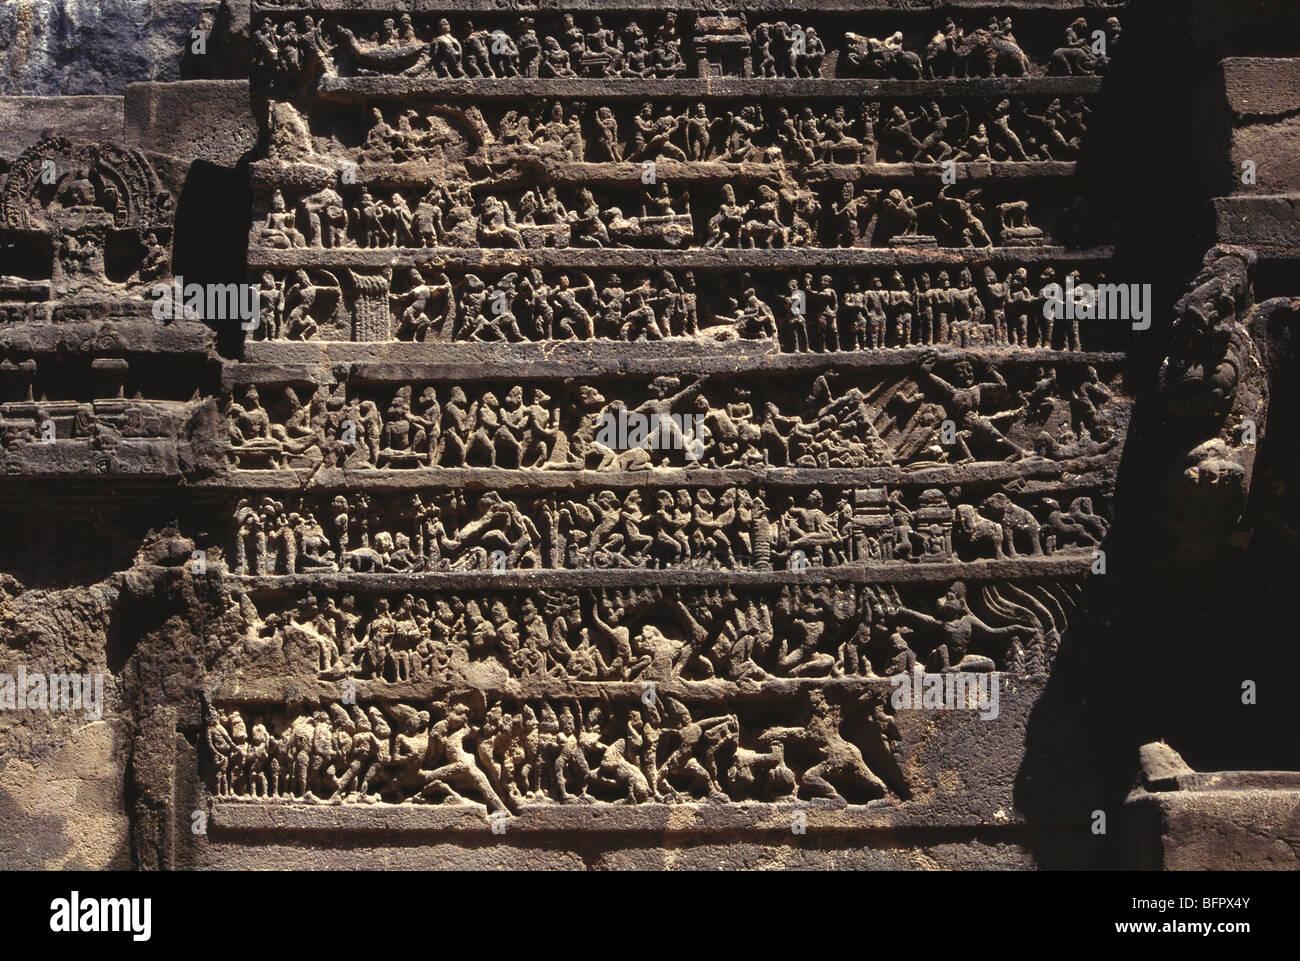 RSC 66575 : Mahabharata scene carved on wall of Kailash temple ; Ellora ; Maharashtra ; India - Stock Image